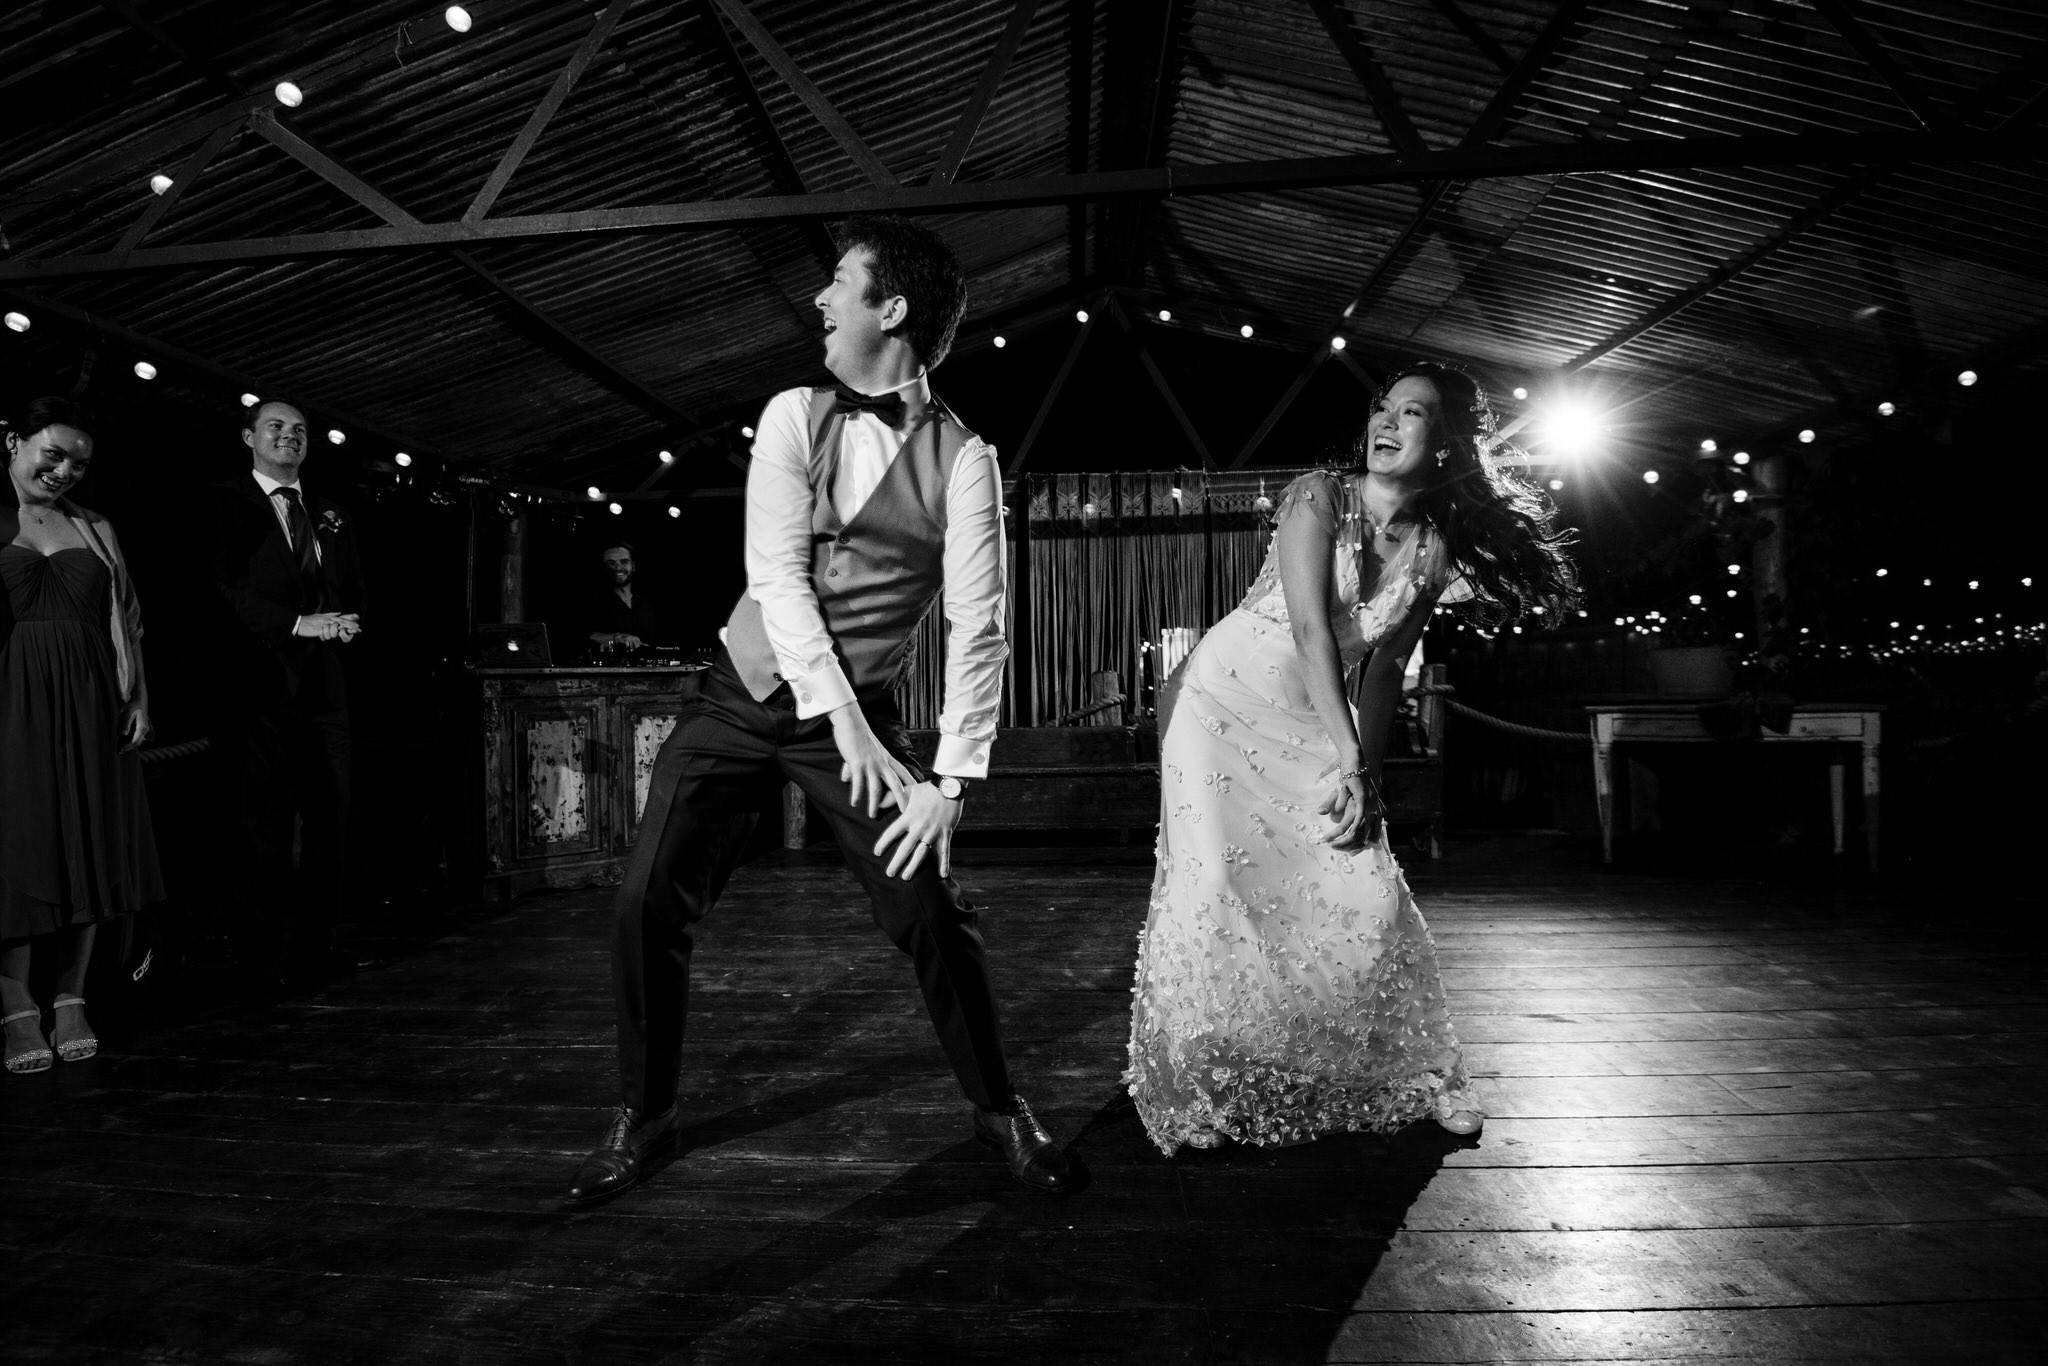 The dreys kent wedding first dance photography